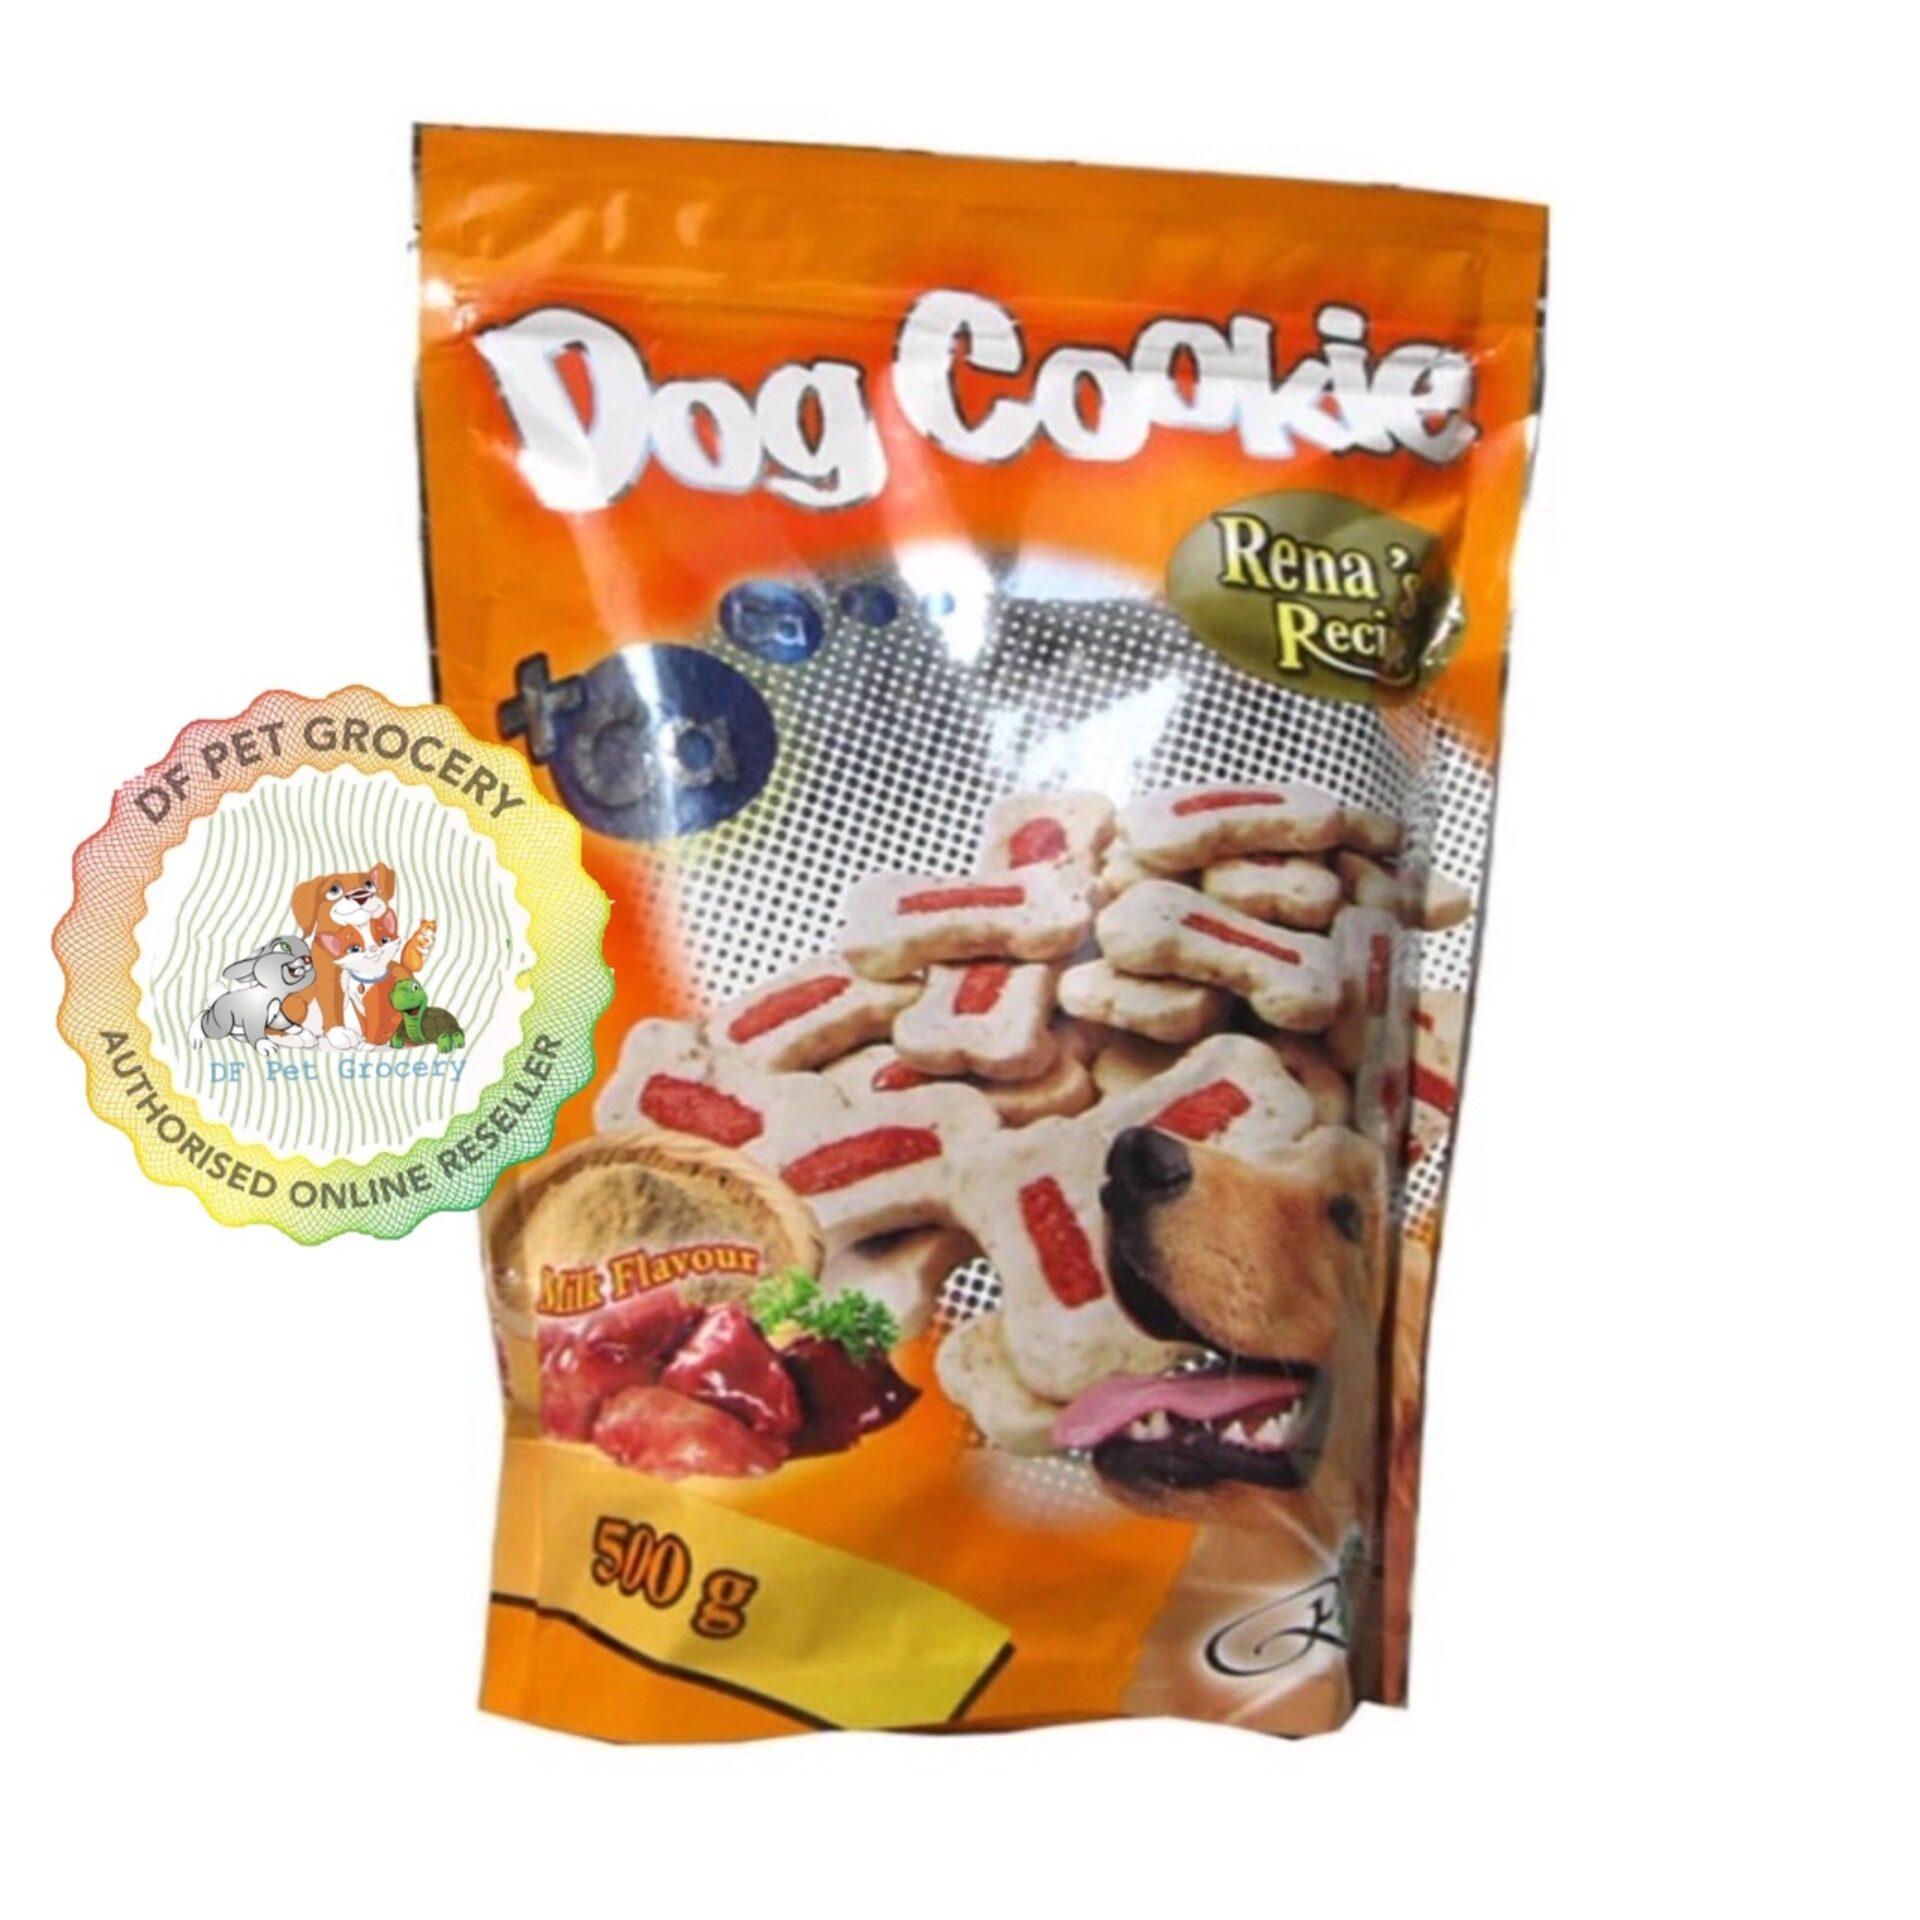 Rena Treats Dog Cookie Liver 500gm - Dog Snack